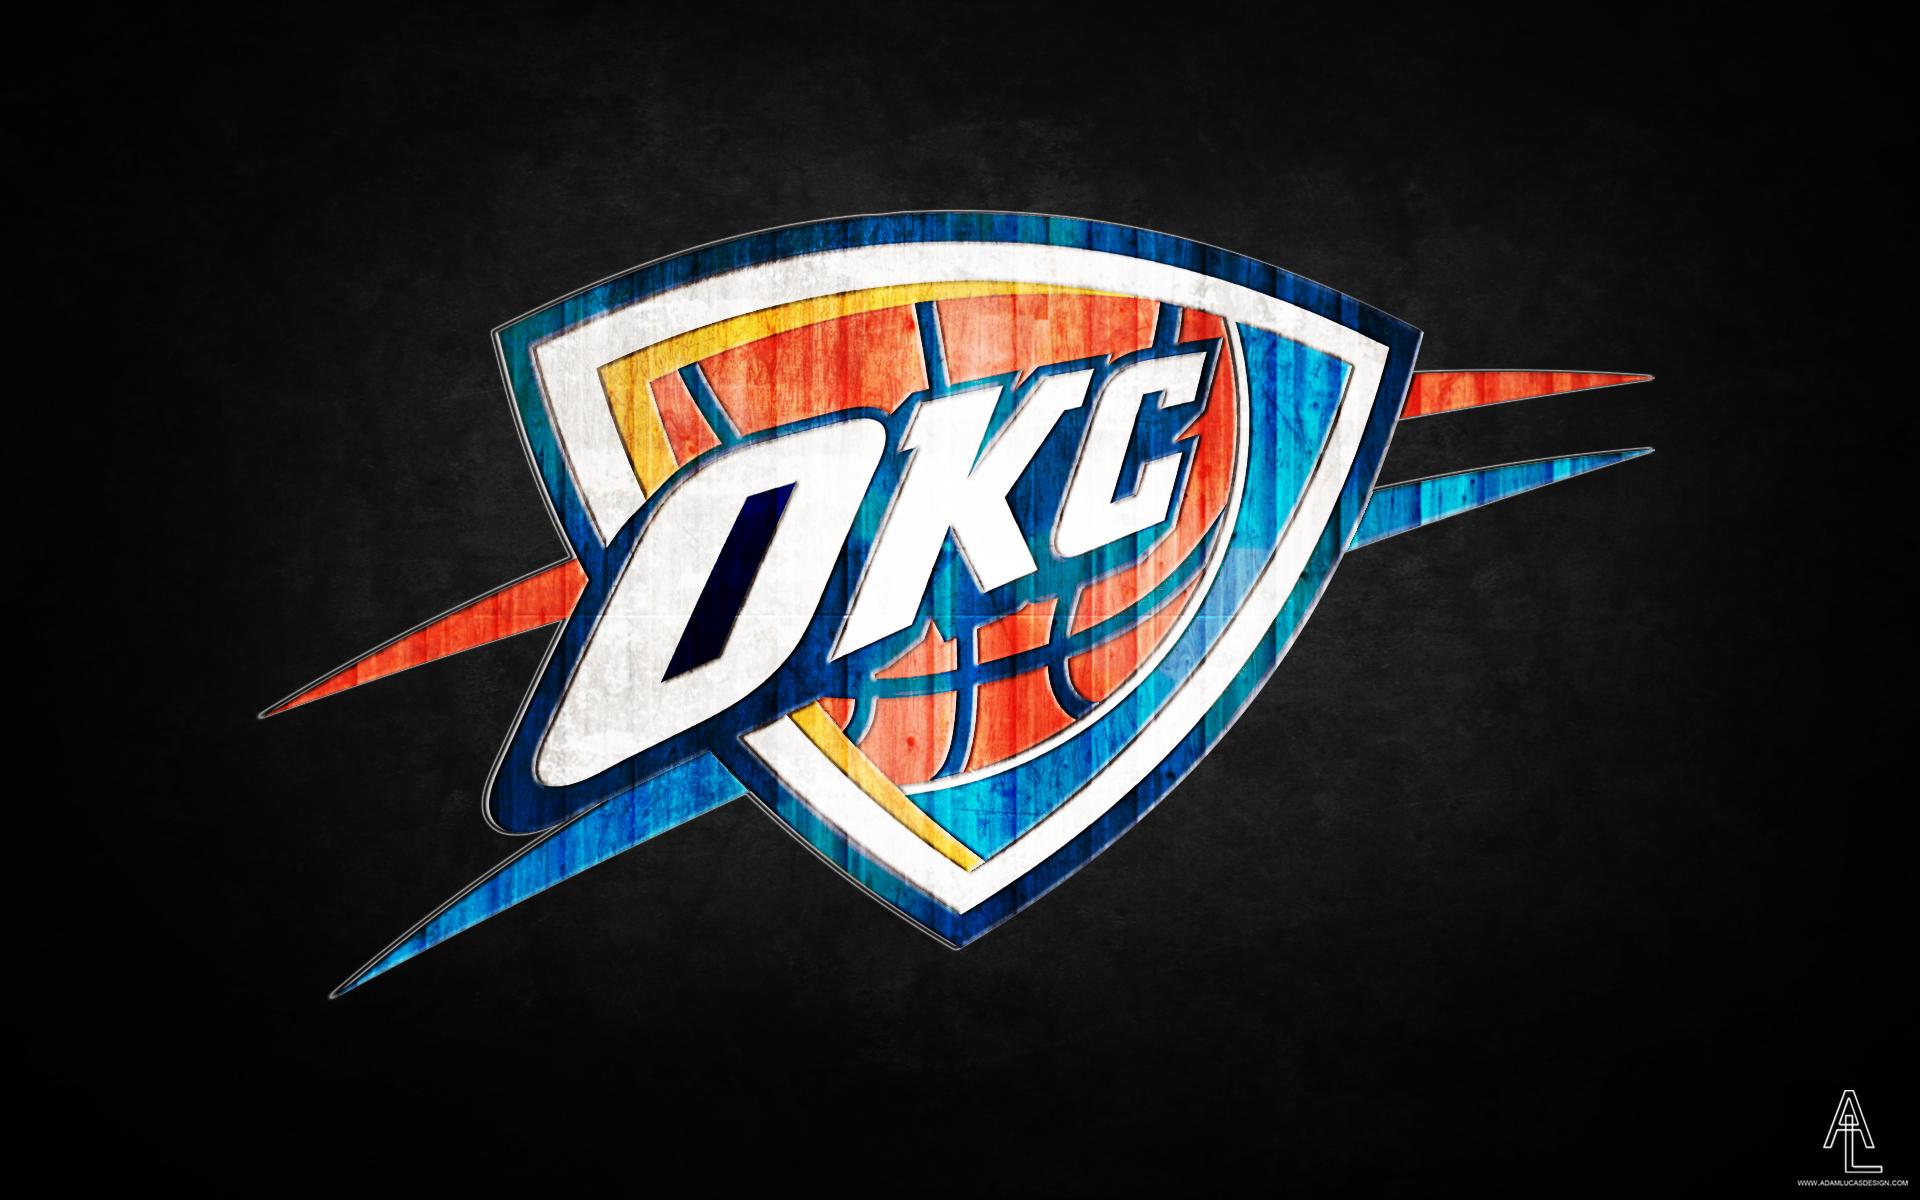 Cool Wallpaper Logo Kevin Durant - okcthunderlogowallpaper  Graphic_715830.jpg